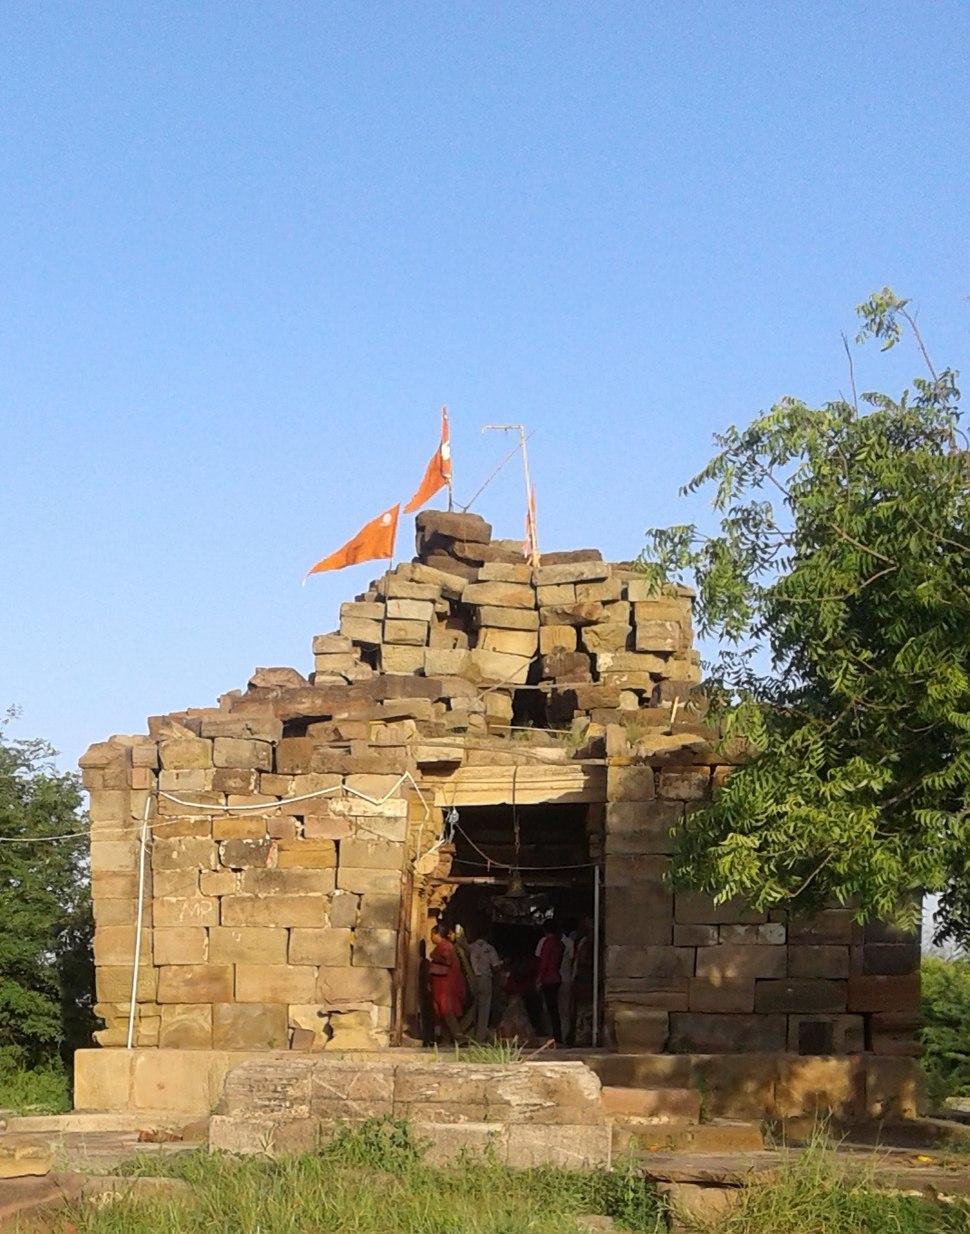 Ruins of Punvareshwar Mahadev temple at Manjal, Kutch, Gujarat